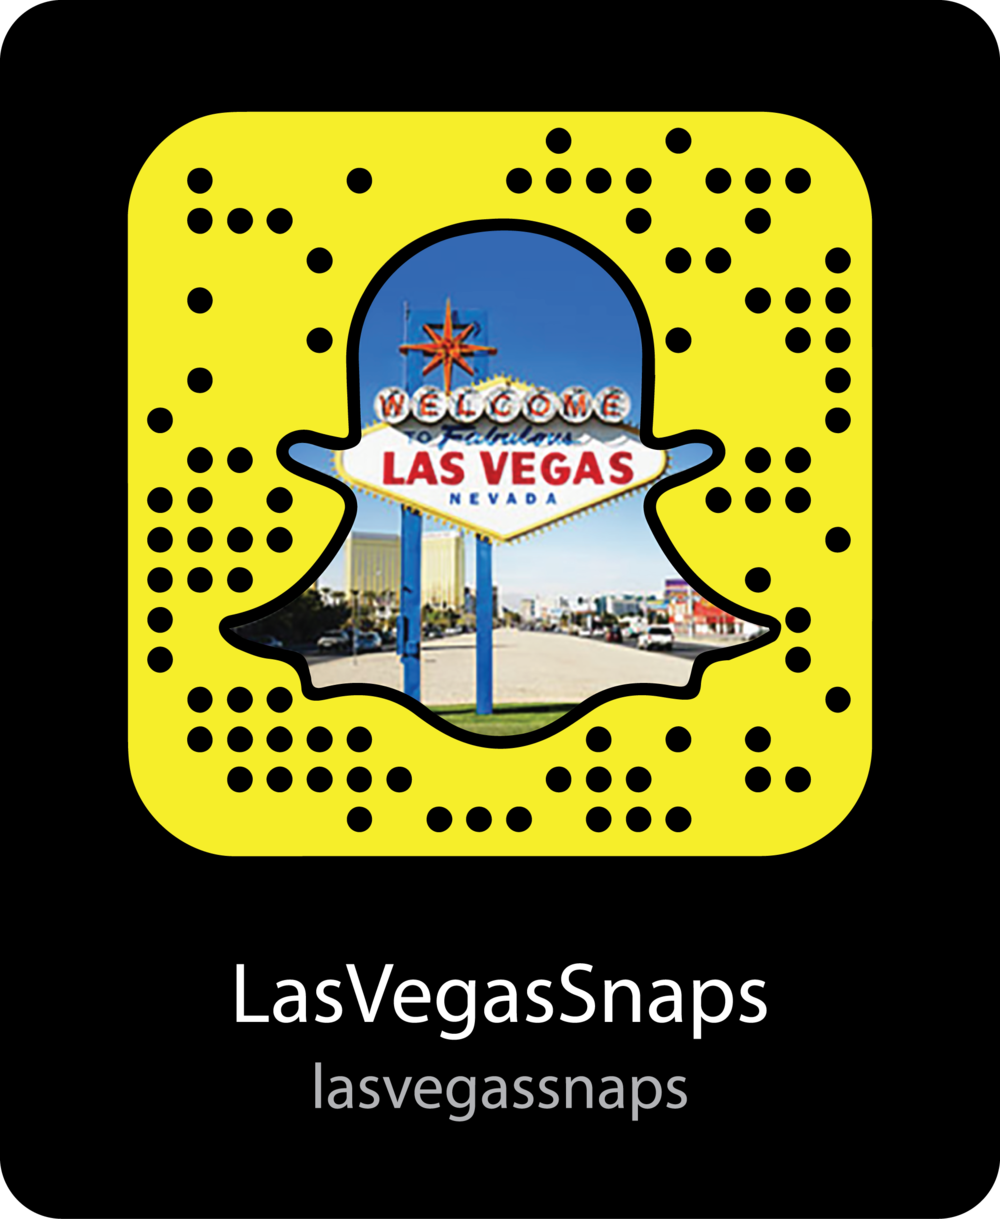 lasvegassnaps-Brands-snapchat-snapcode.png